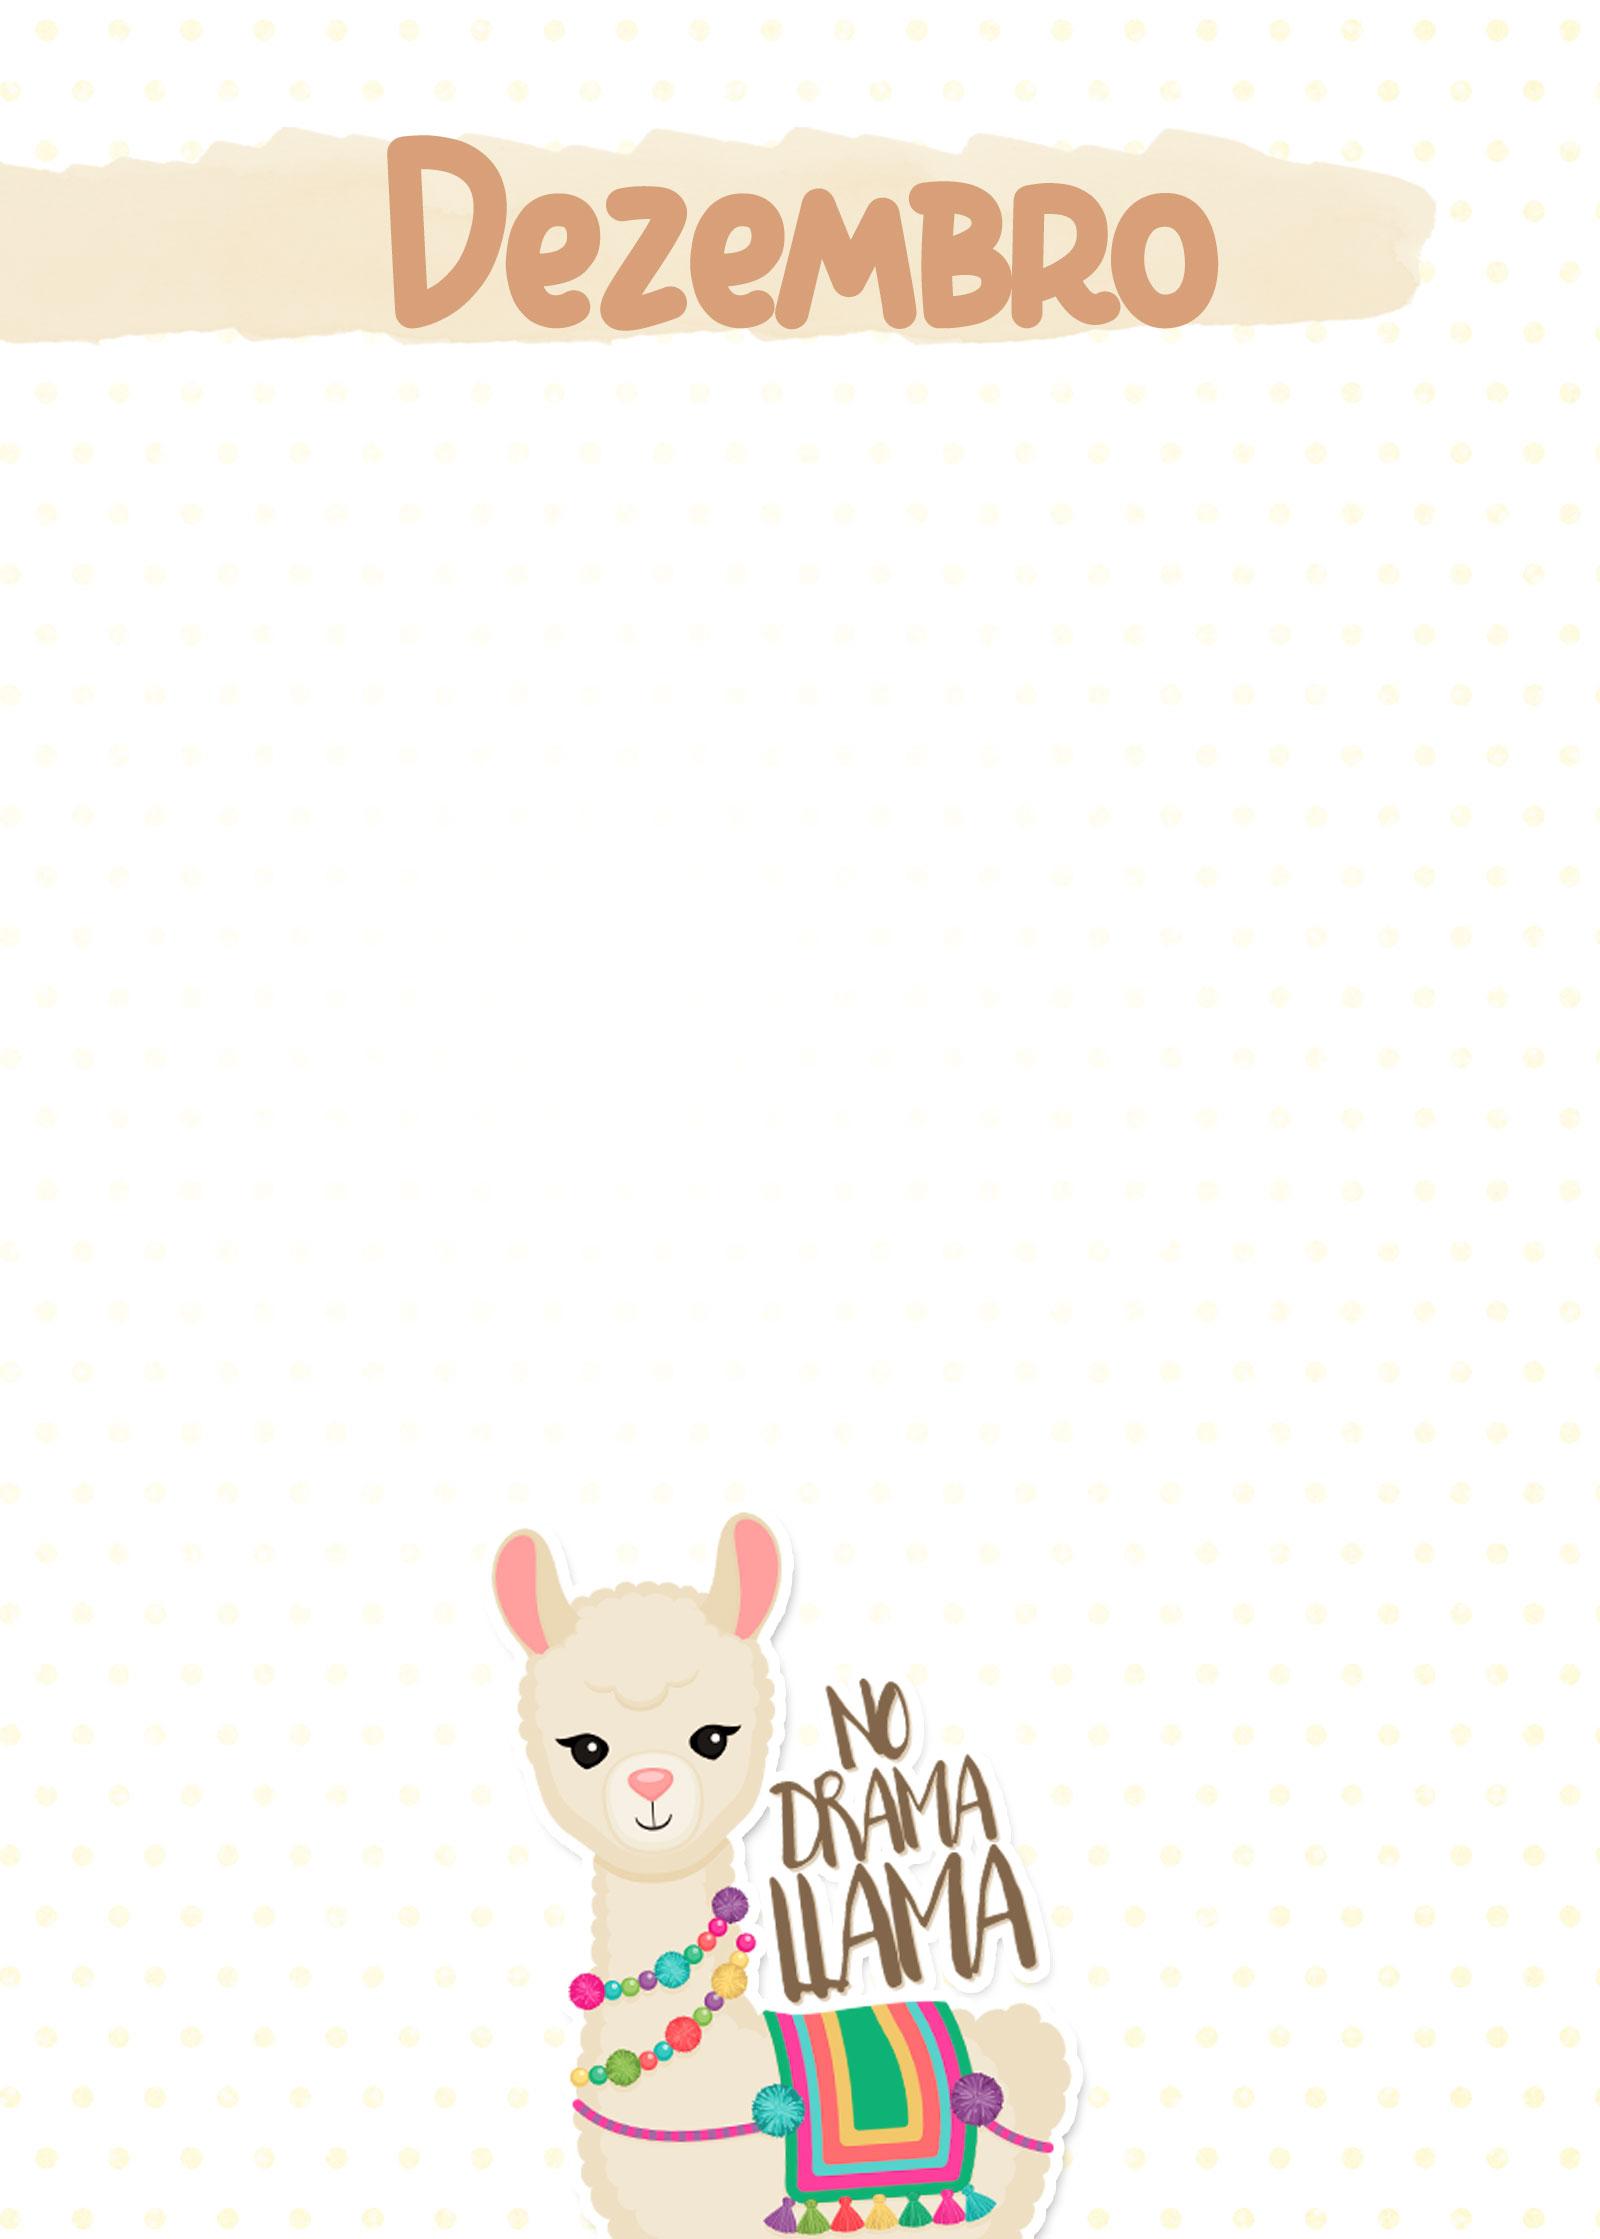 Planner Lhama Amarela capa dezembro